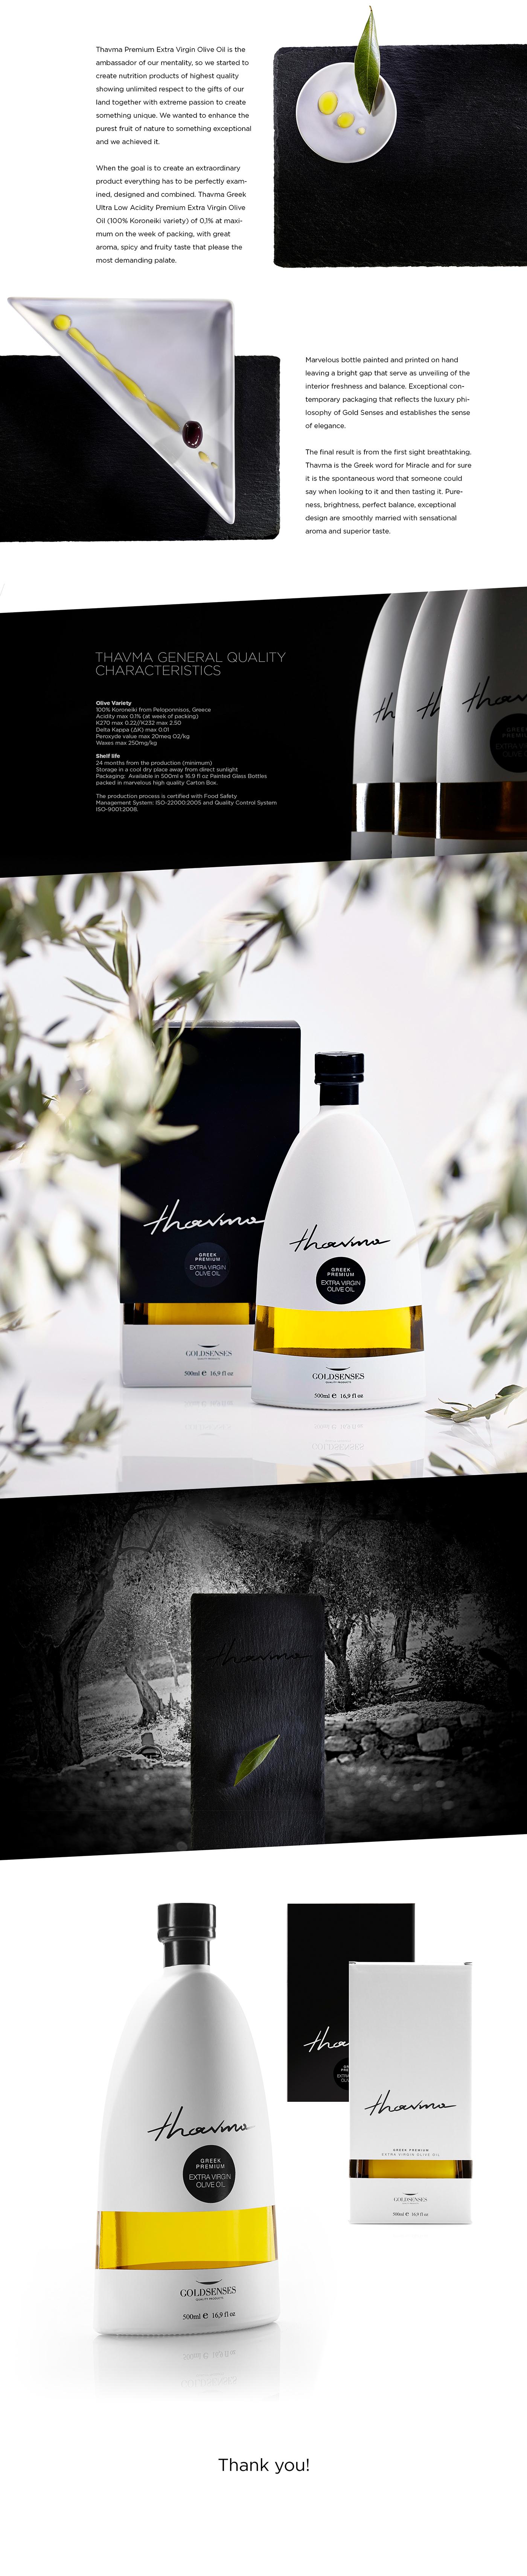 olive oil Packaging design graphic design